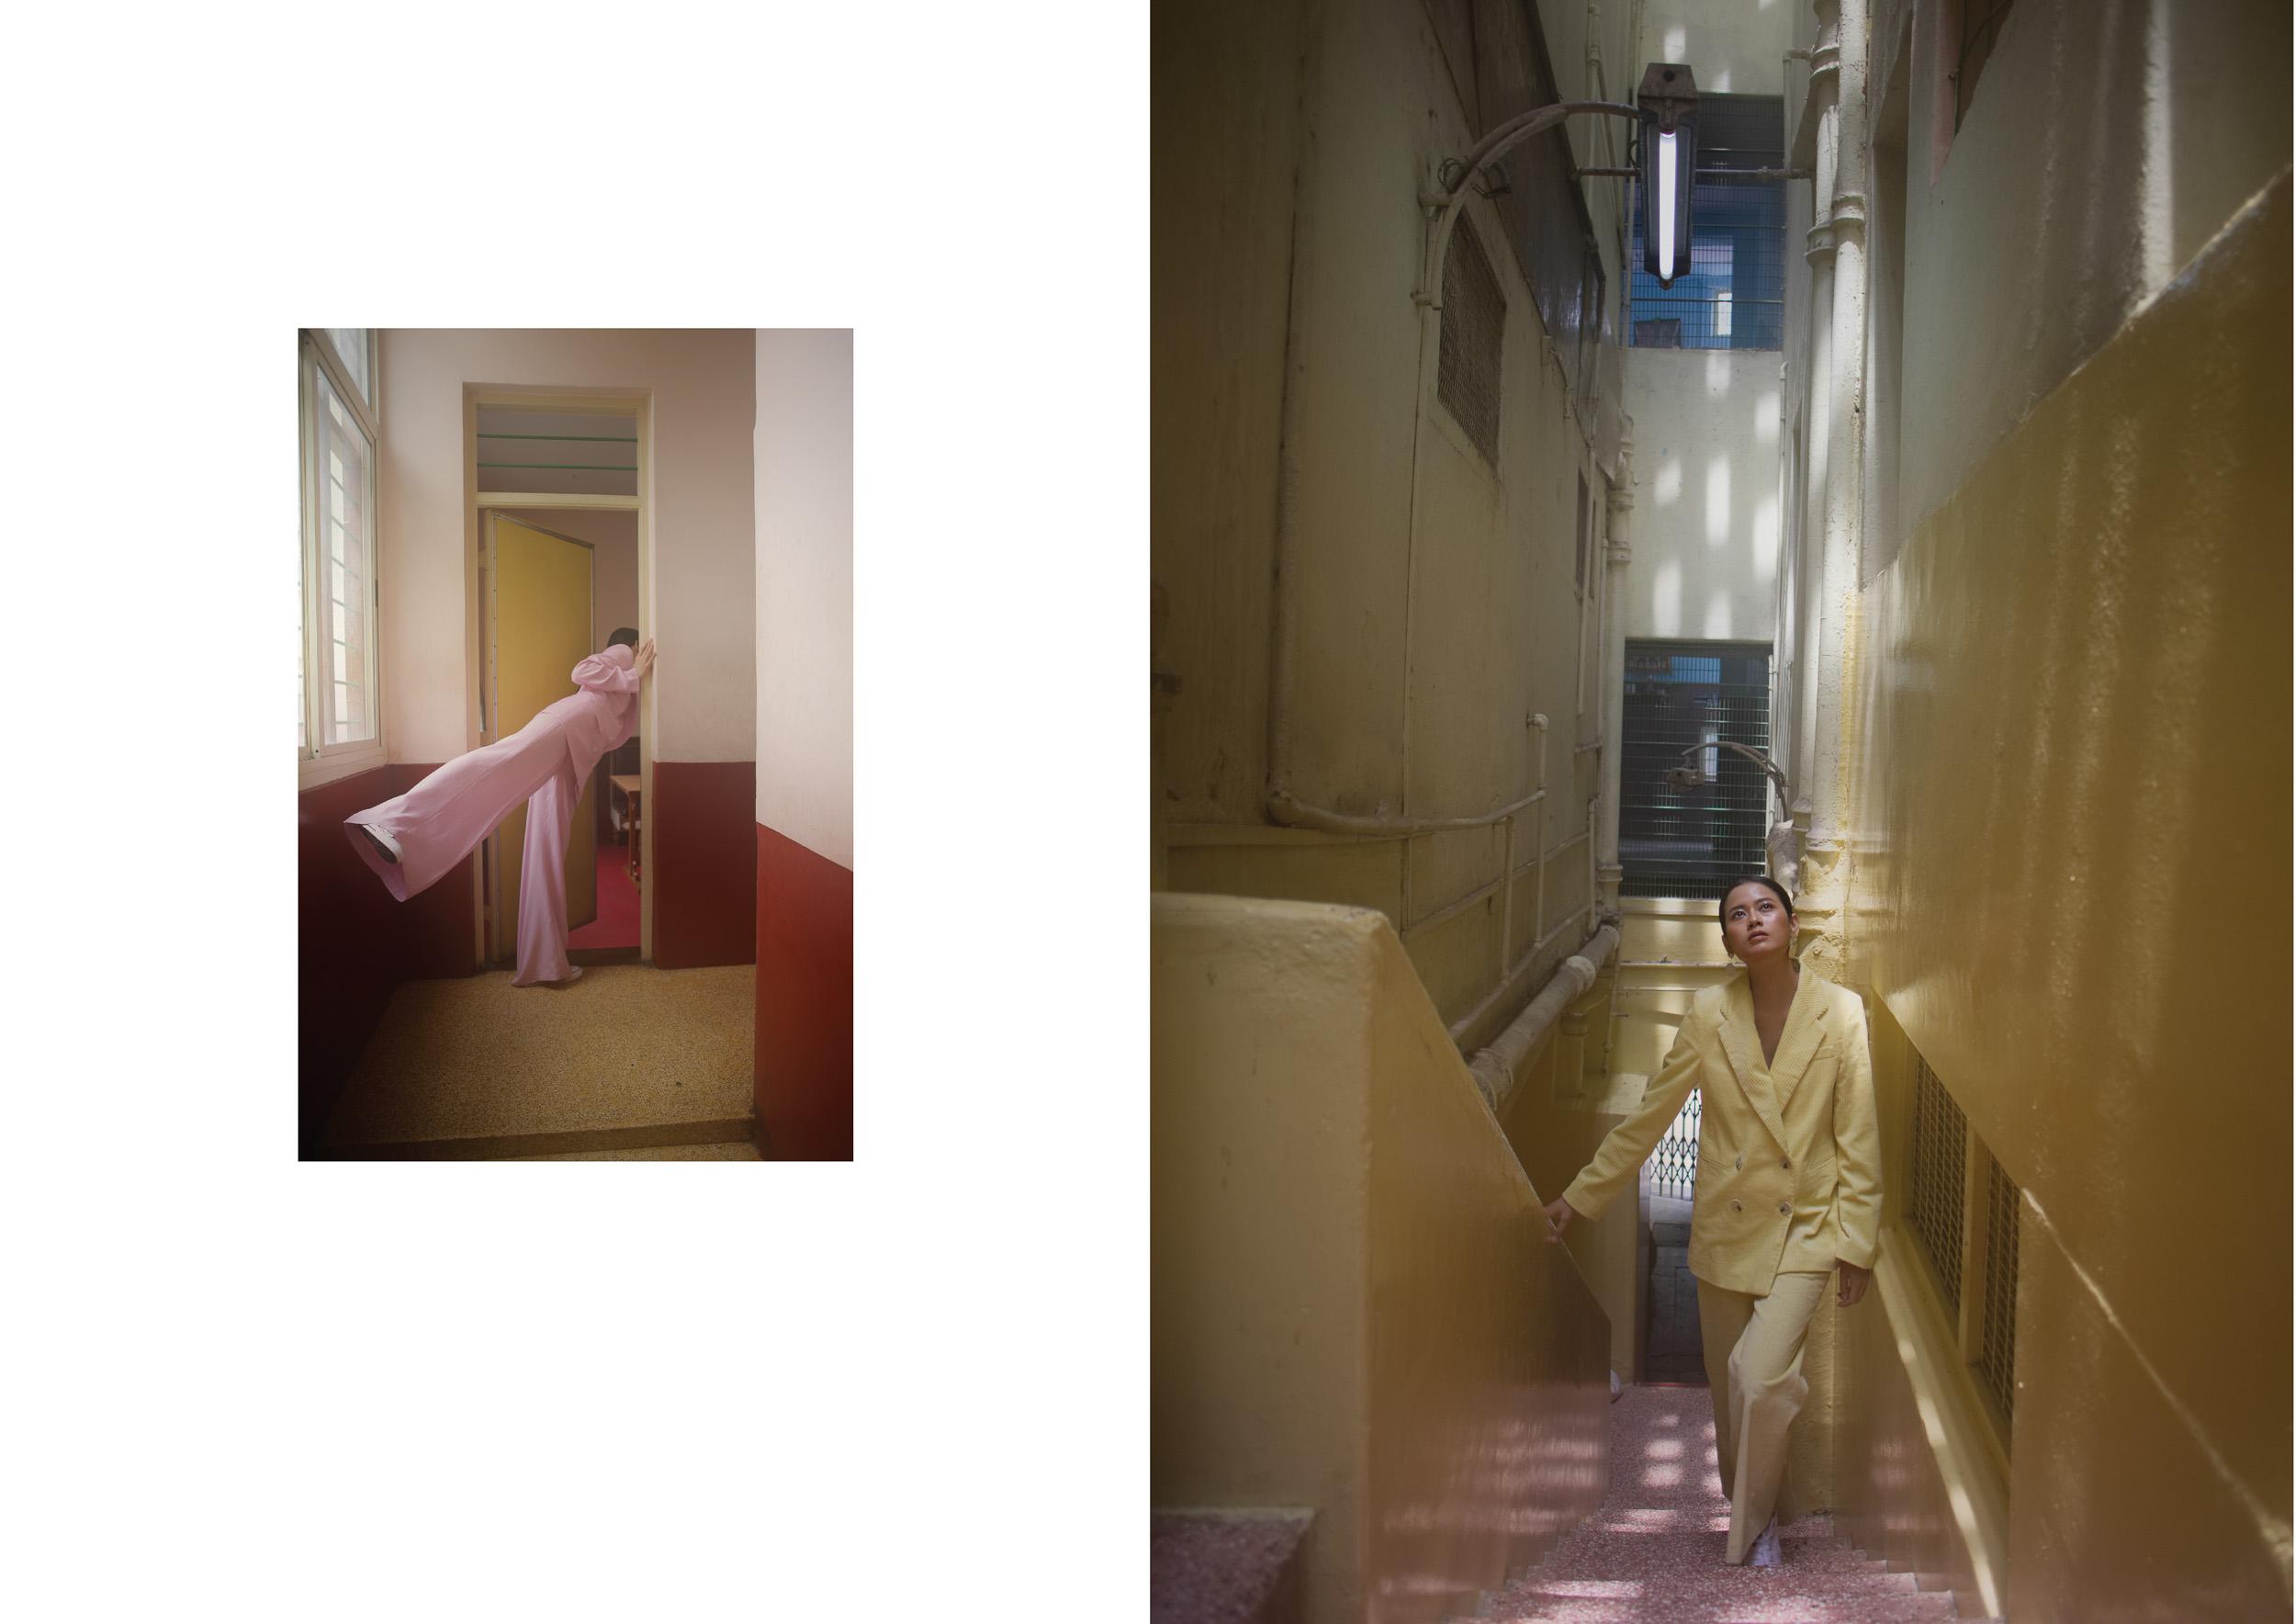 Sindhur_Photography_Fashion_StopTheExcuses-5.JPG